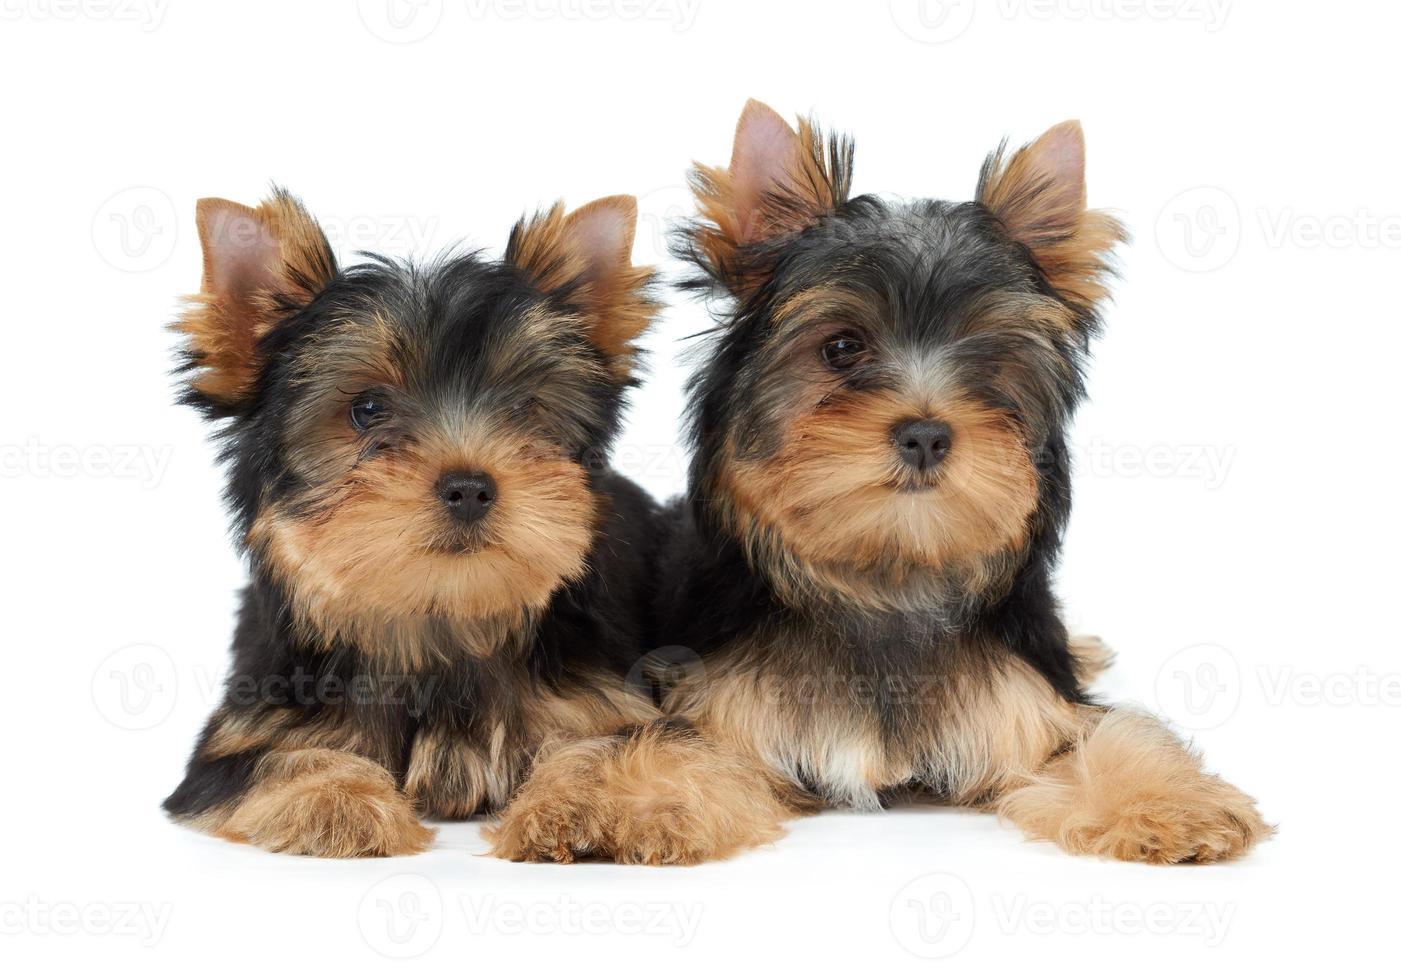 twee kleine huisdieren foto